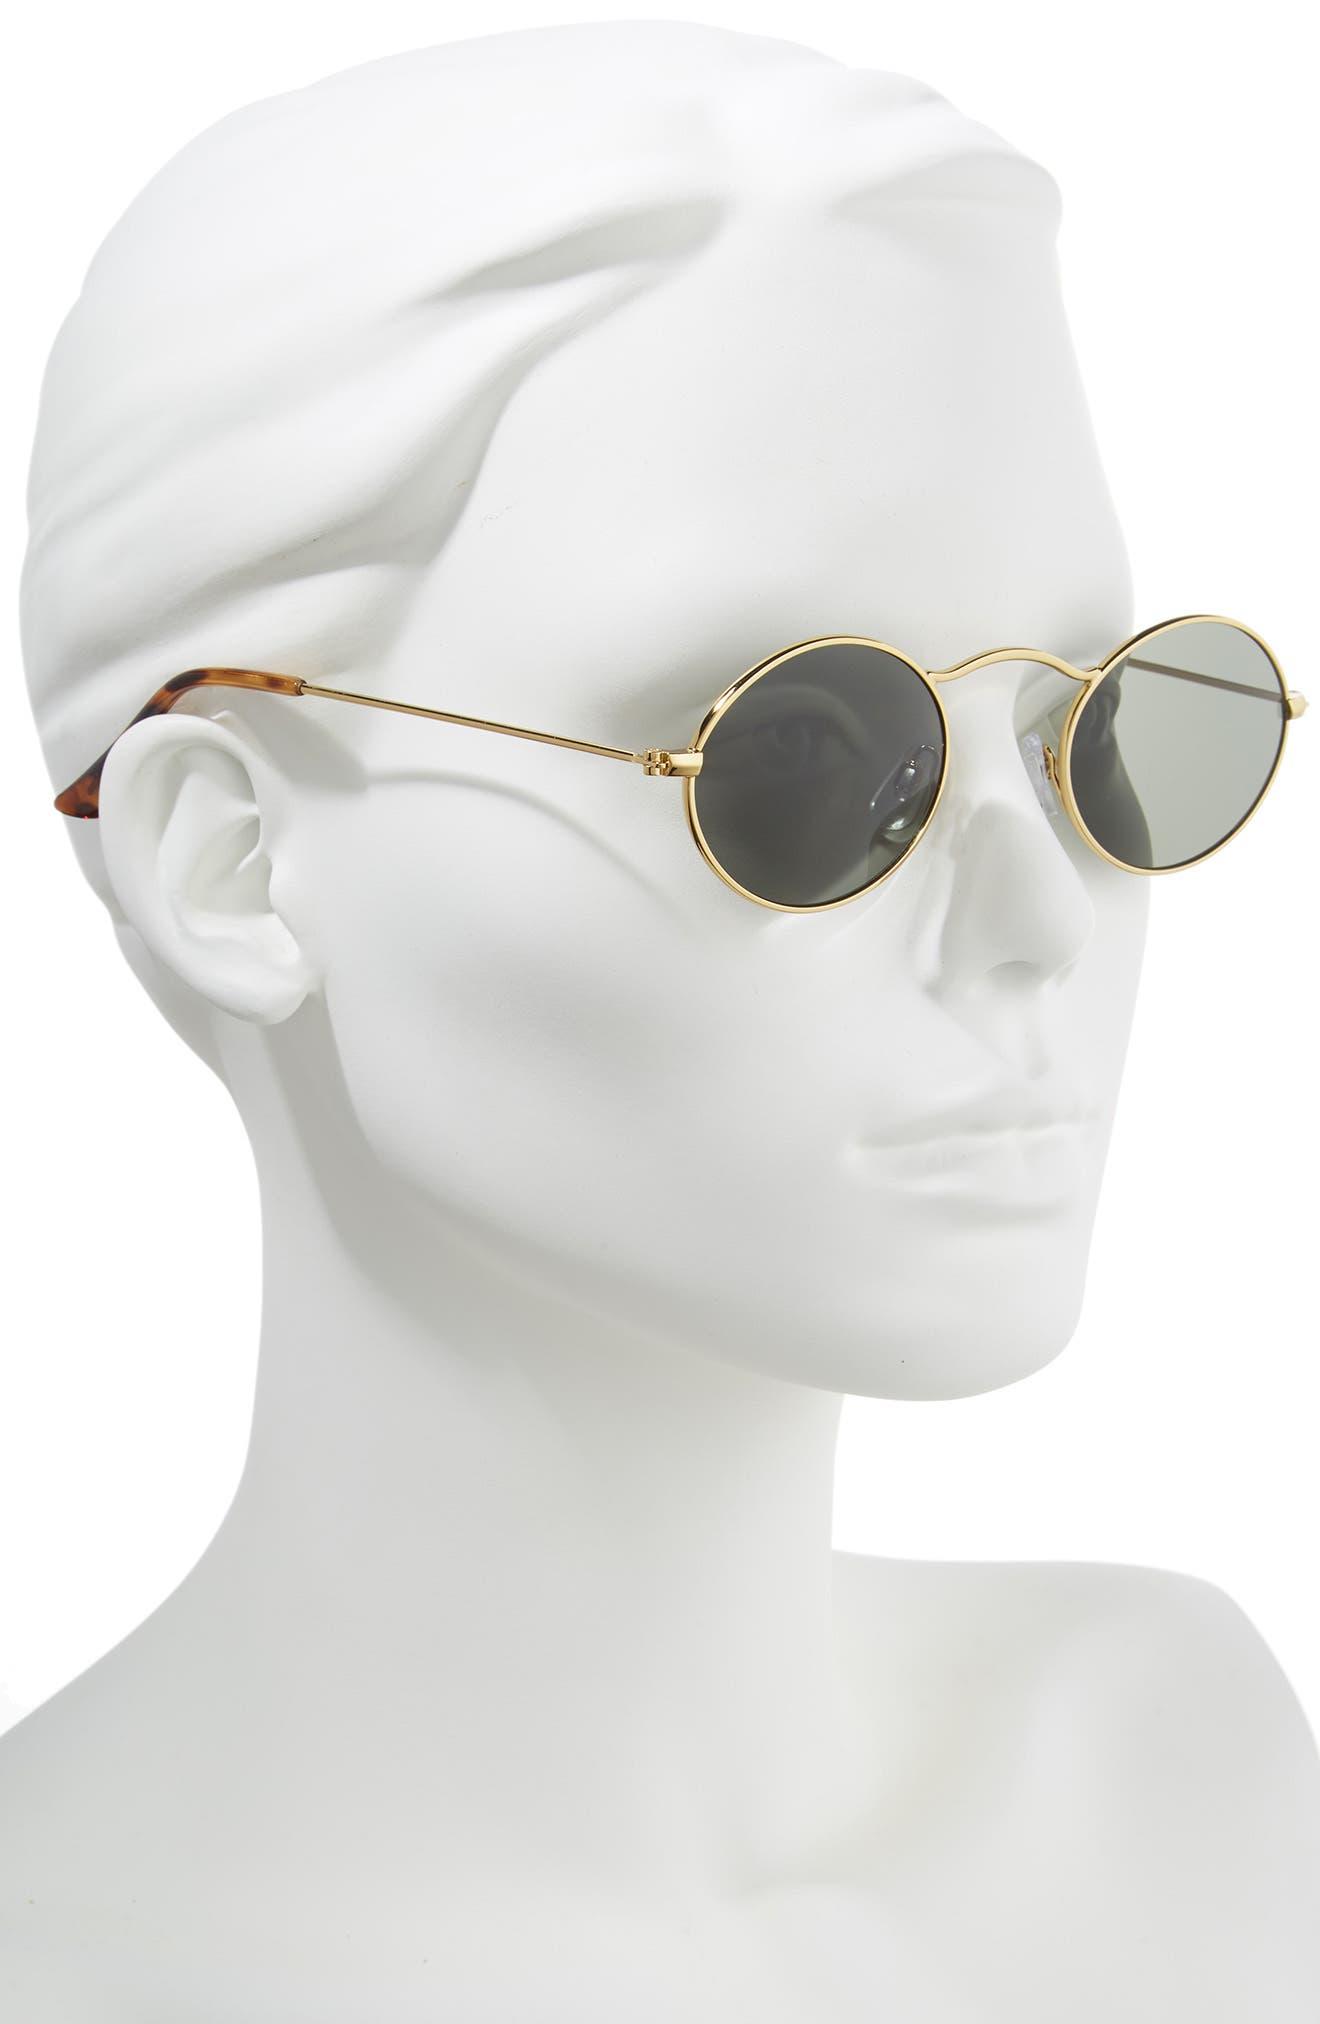 48mm Small Oval Sunglasses,                             Alternate thumbnail 2, color,                             Gold/ Black